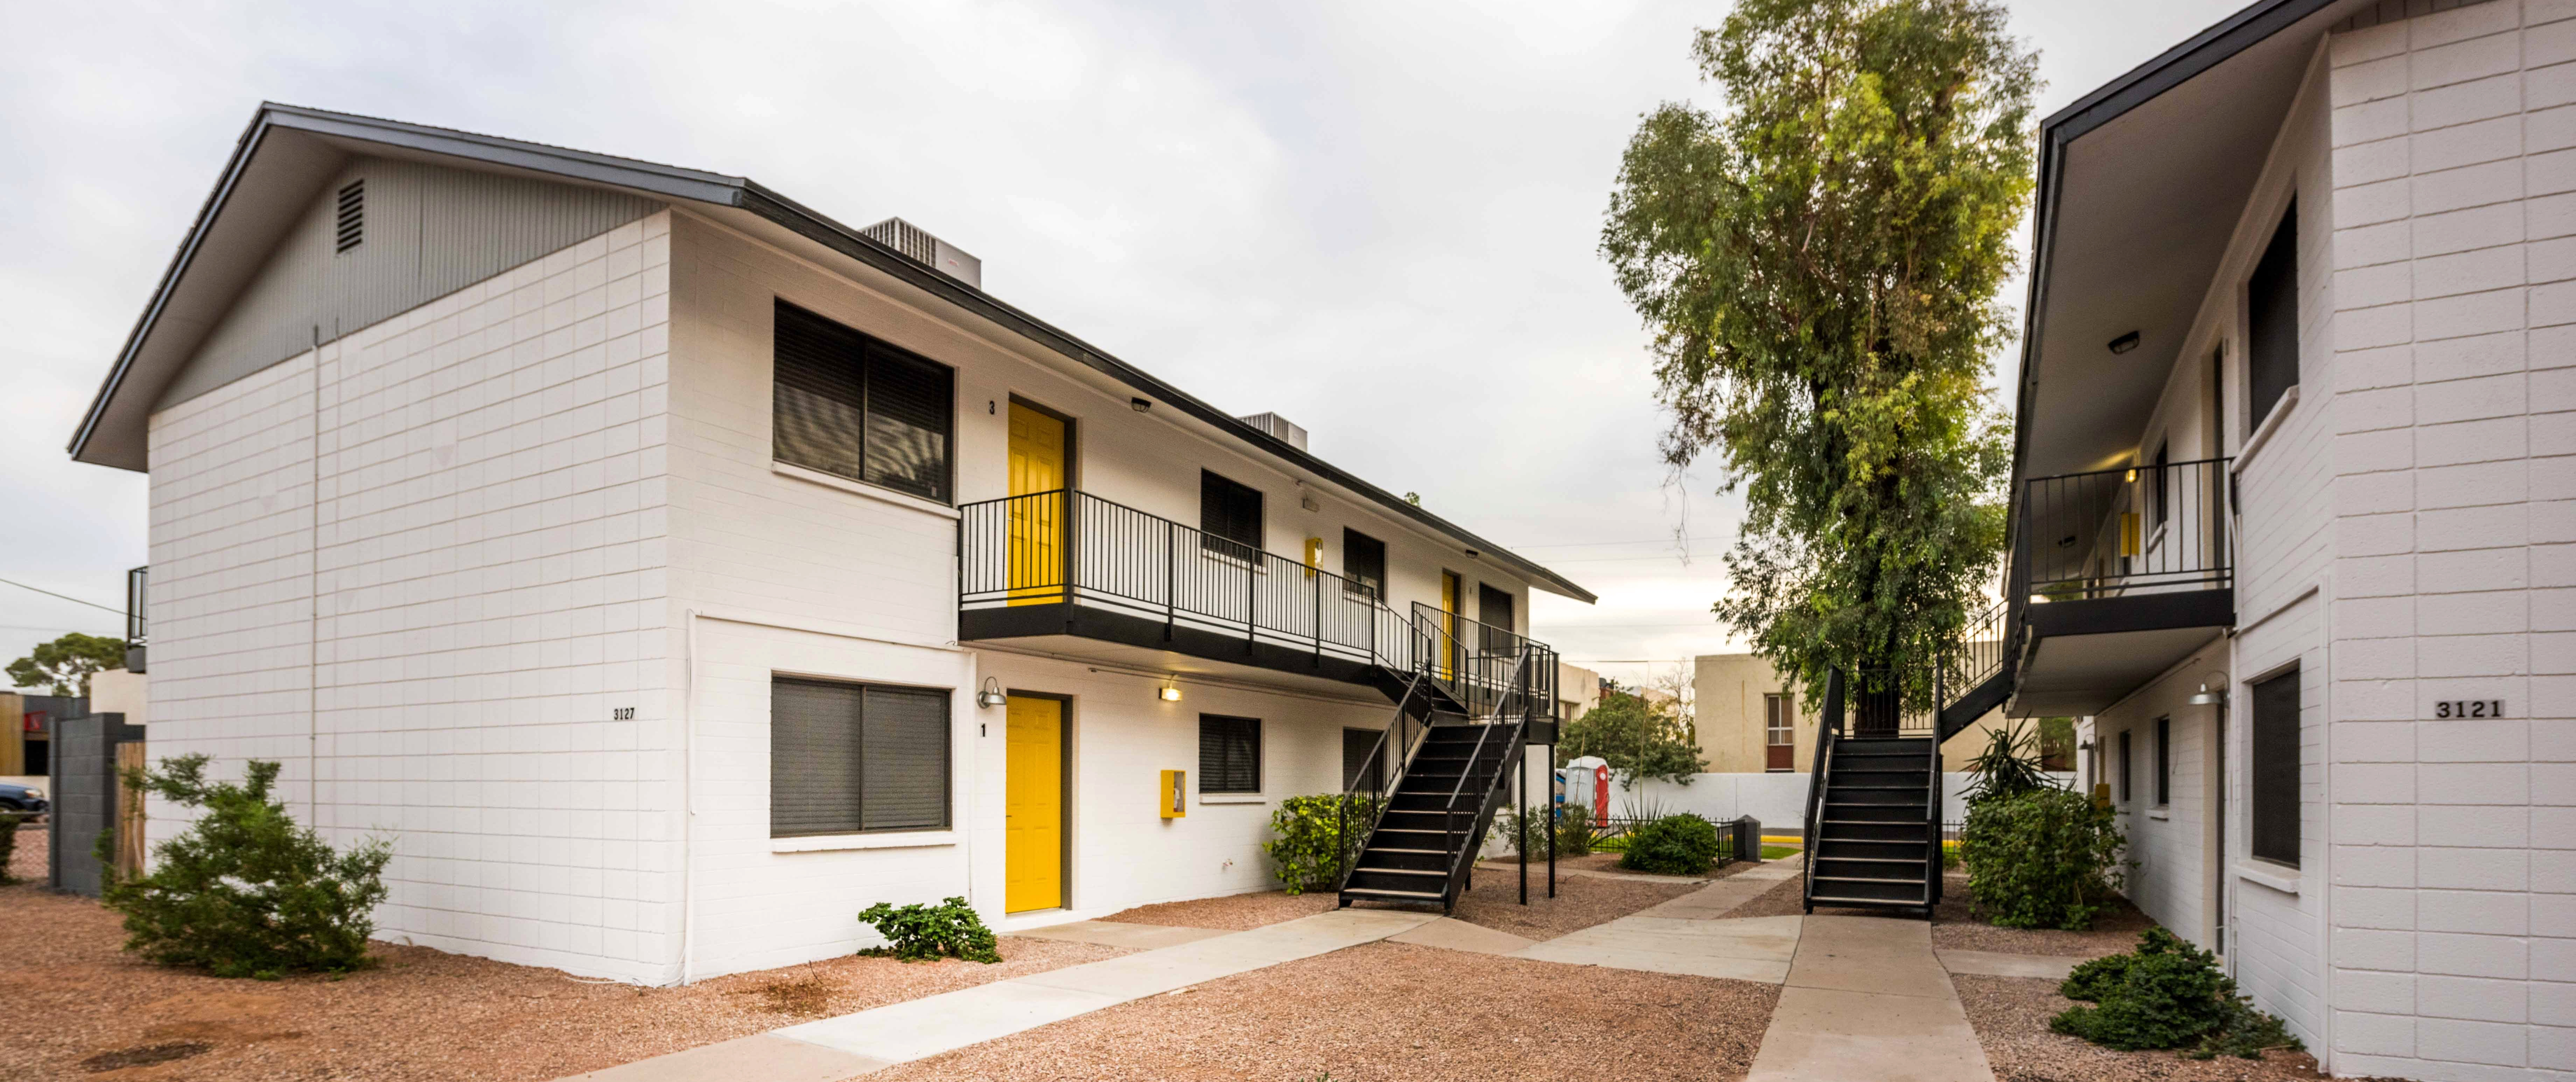 3105 E Fairmount Ave, Phoenix, AZ 85016 | Biltmore Phoenix